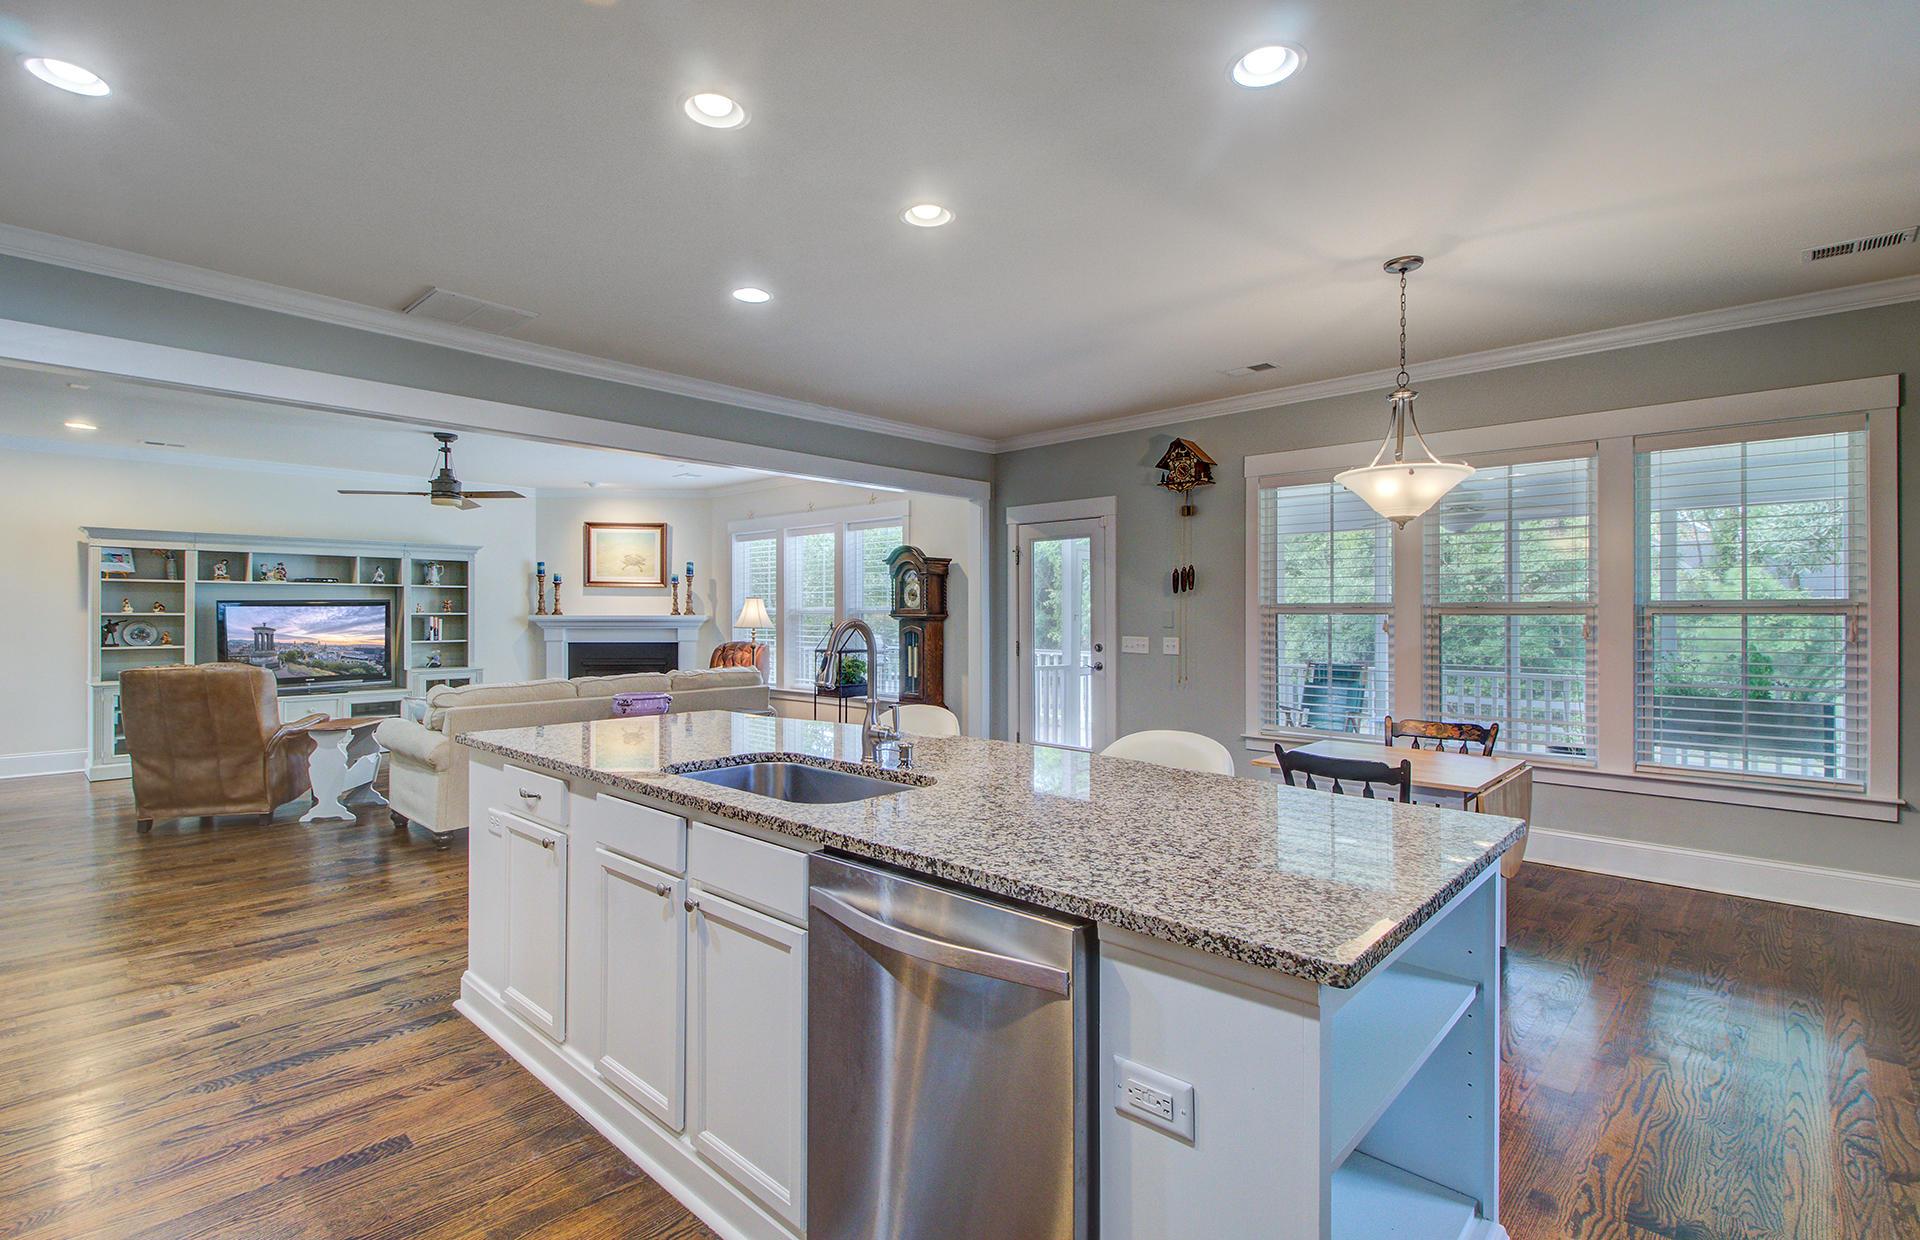 Scotts Creek Homes For Sale - 1404 Scotts Creek, Mount Pleasant, SC - 31